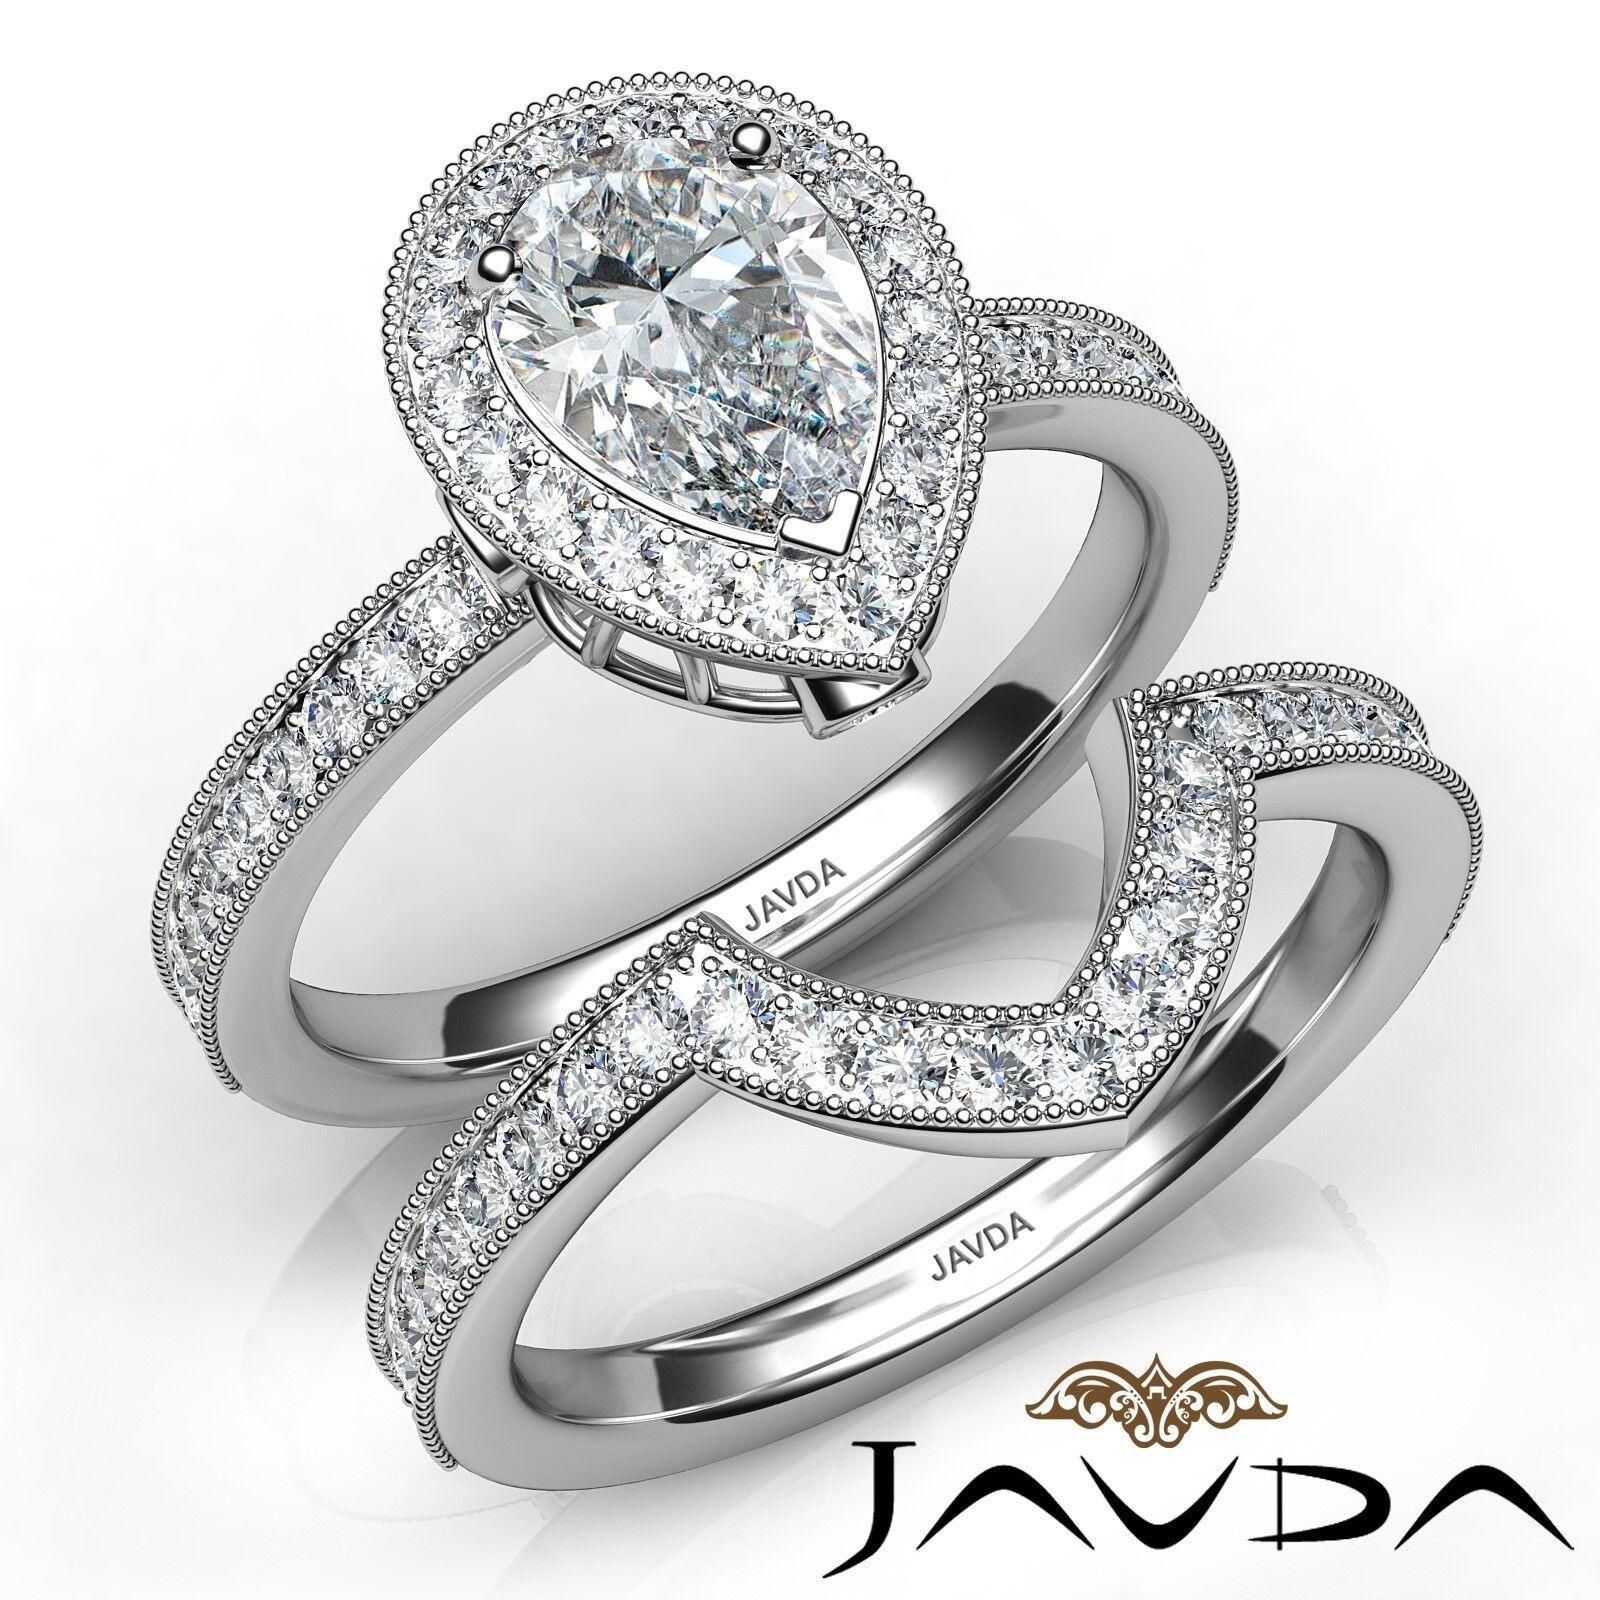 1.94Ct Halo Milgrain Bezel Bridal Pear Diamond Engagement Ring GIA I-VVS1 W Gold